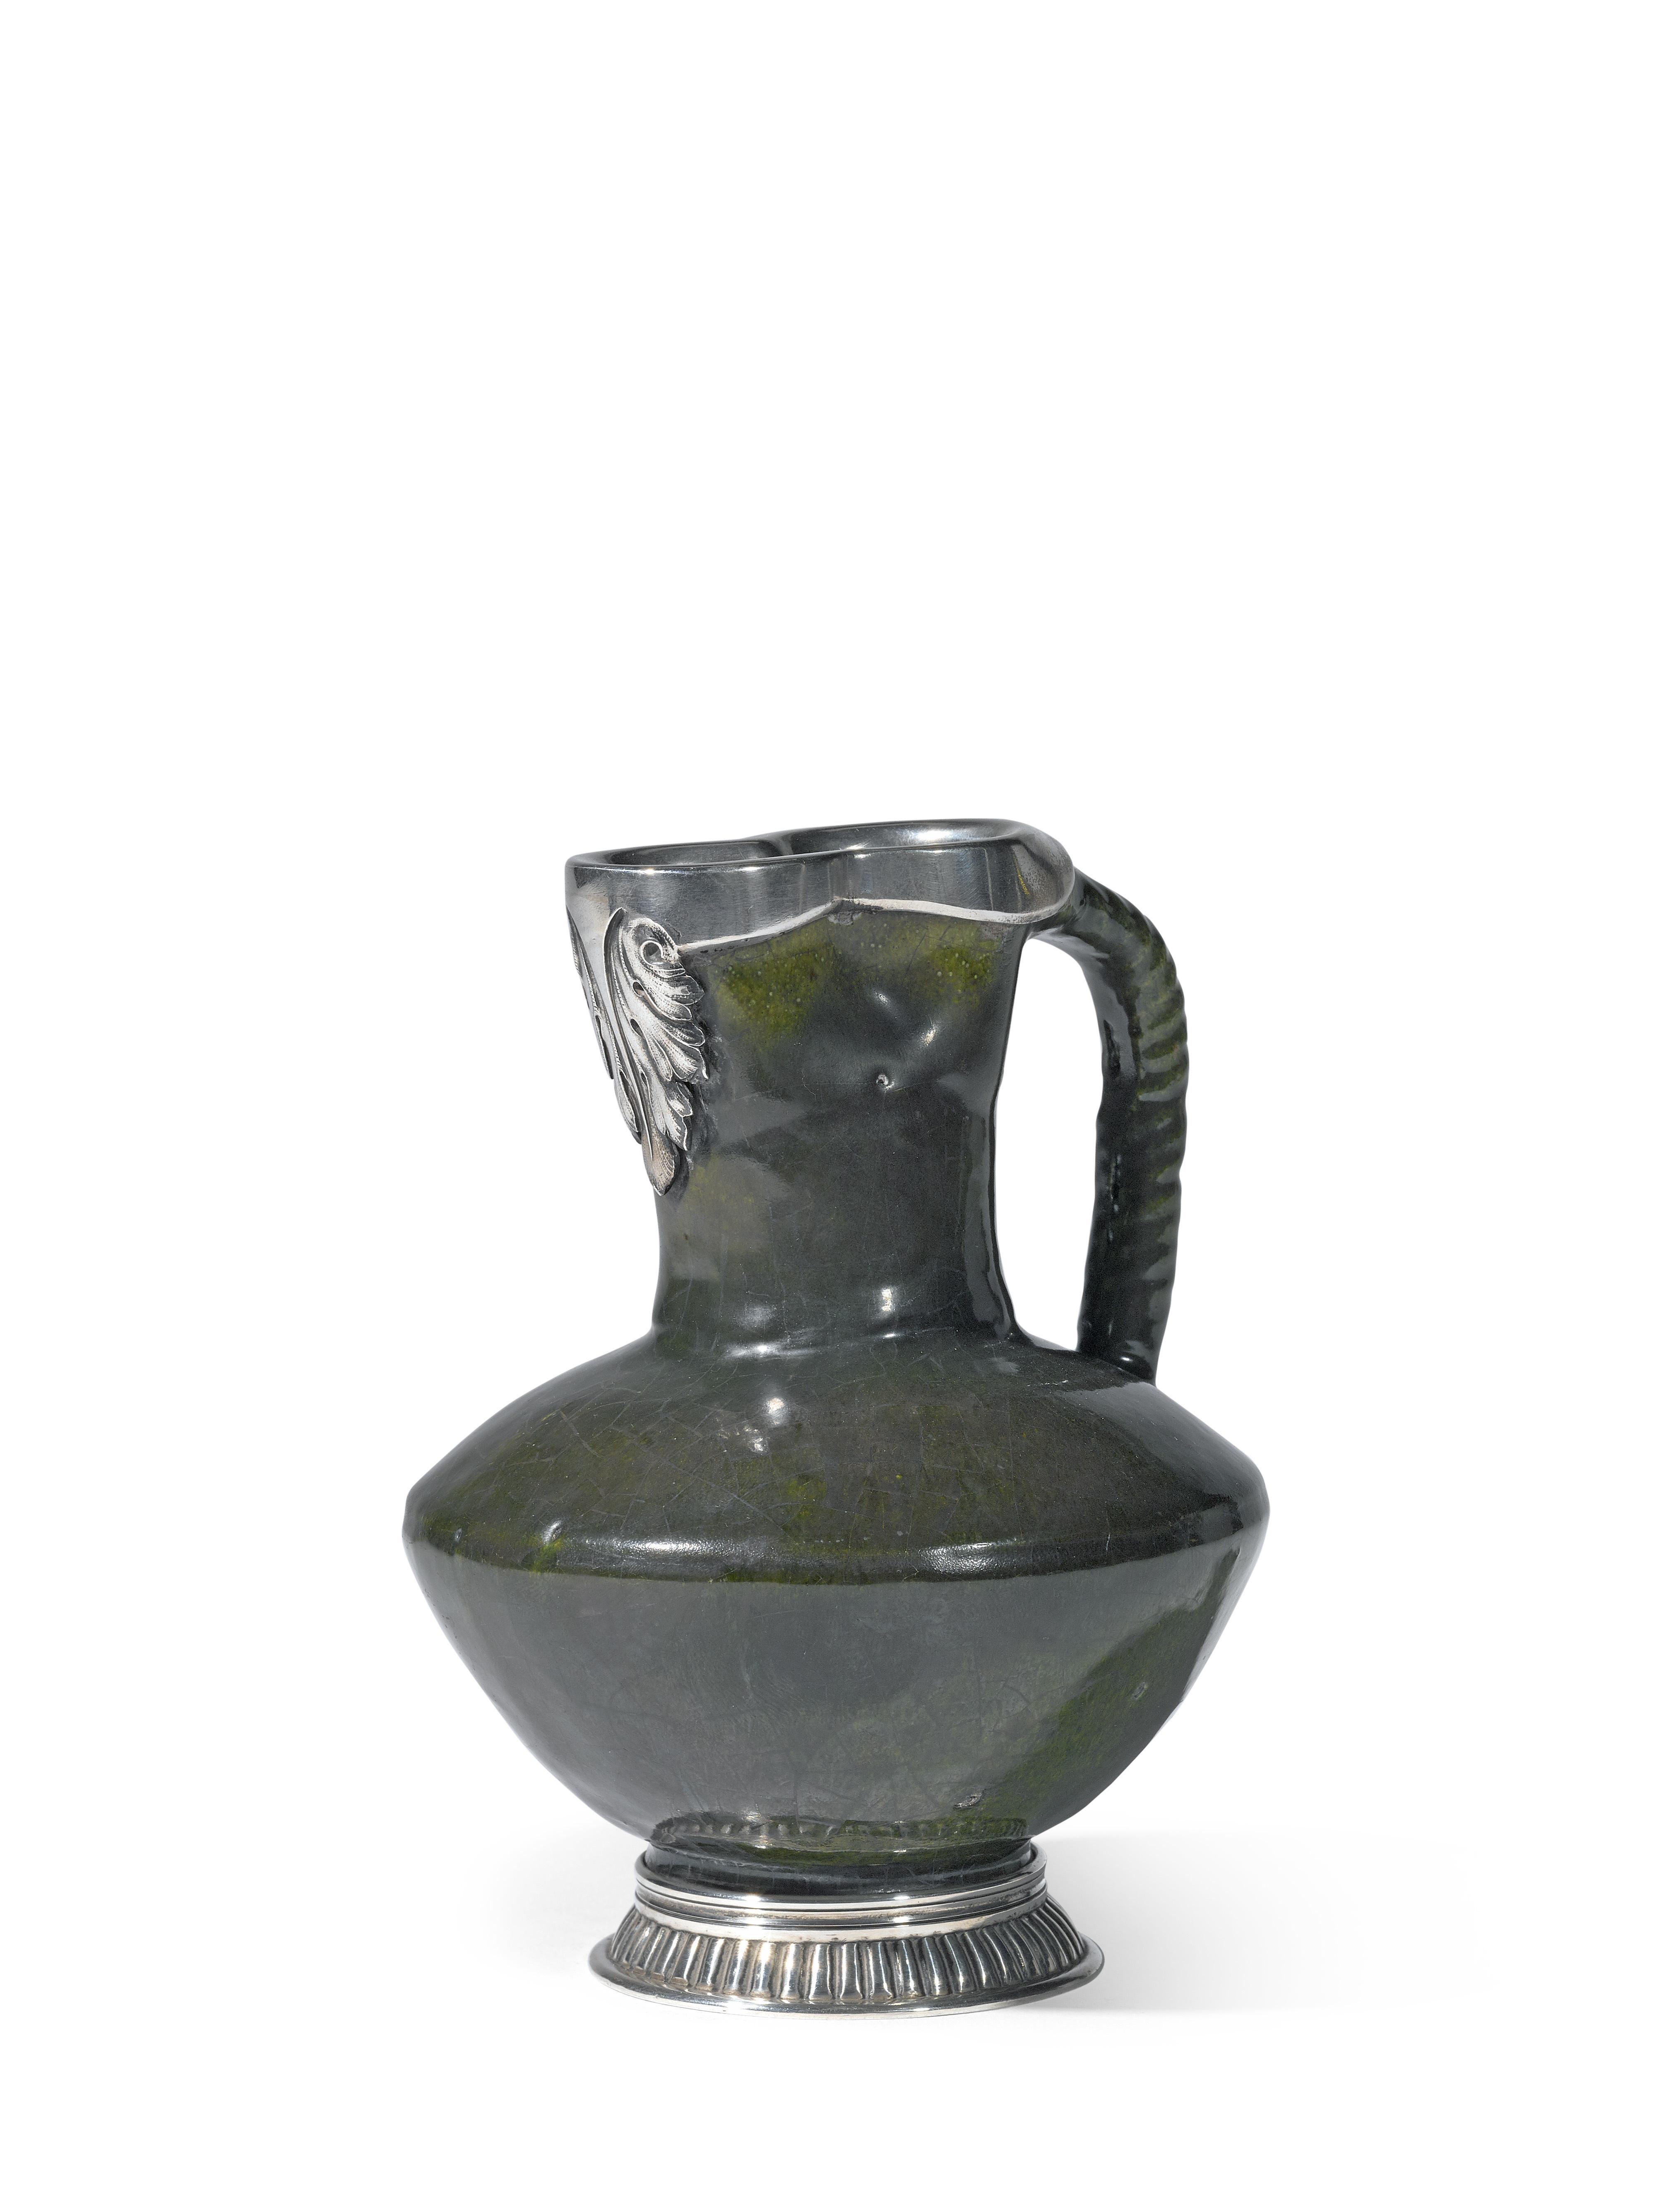 View 1 of Lot 279. A Fabergé silver-mounted ceramic jug, workmaster Julius Rappoport, St Petersburg, circa 1890.